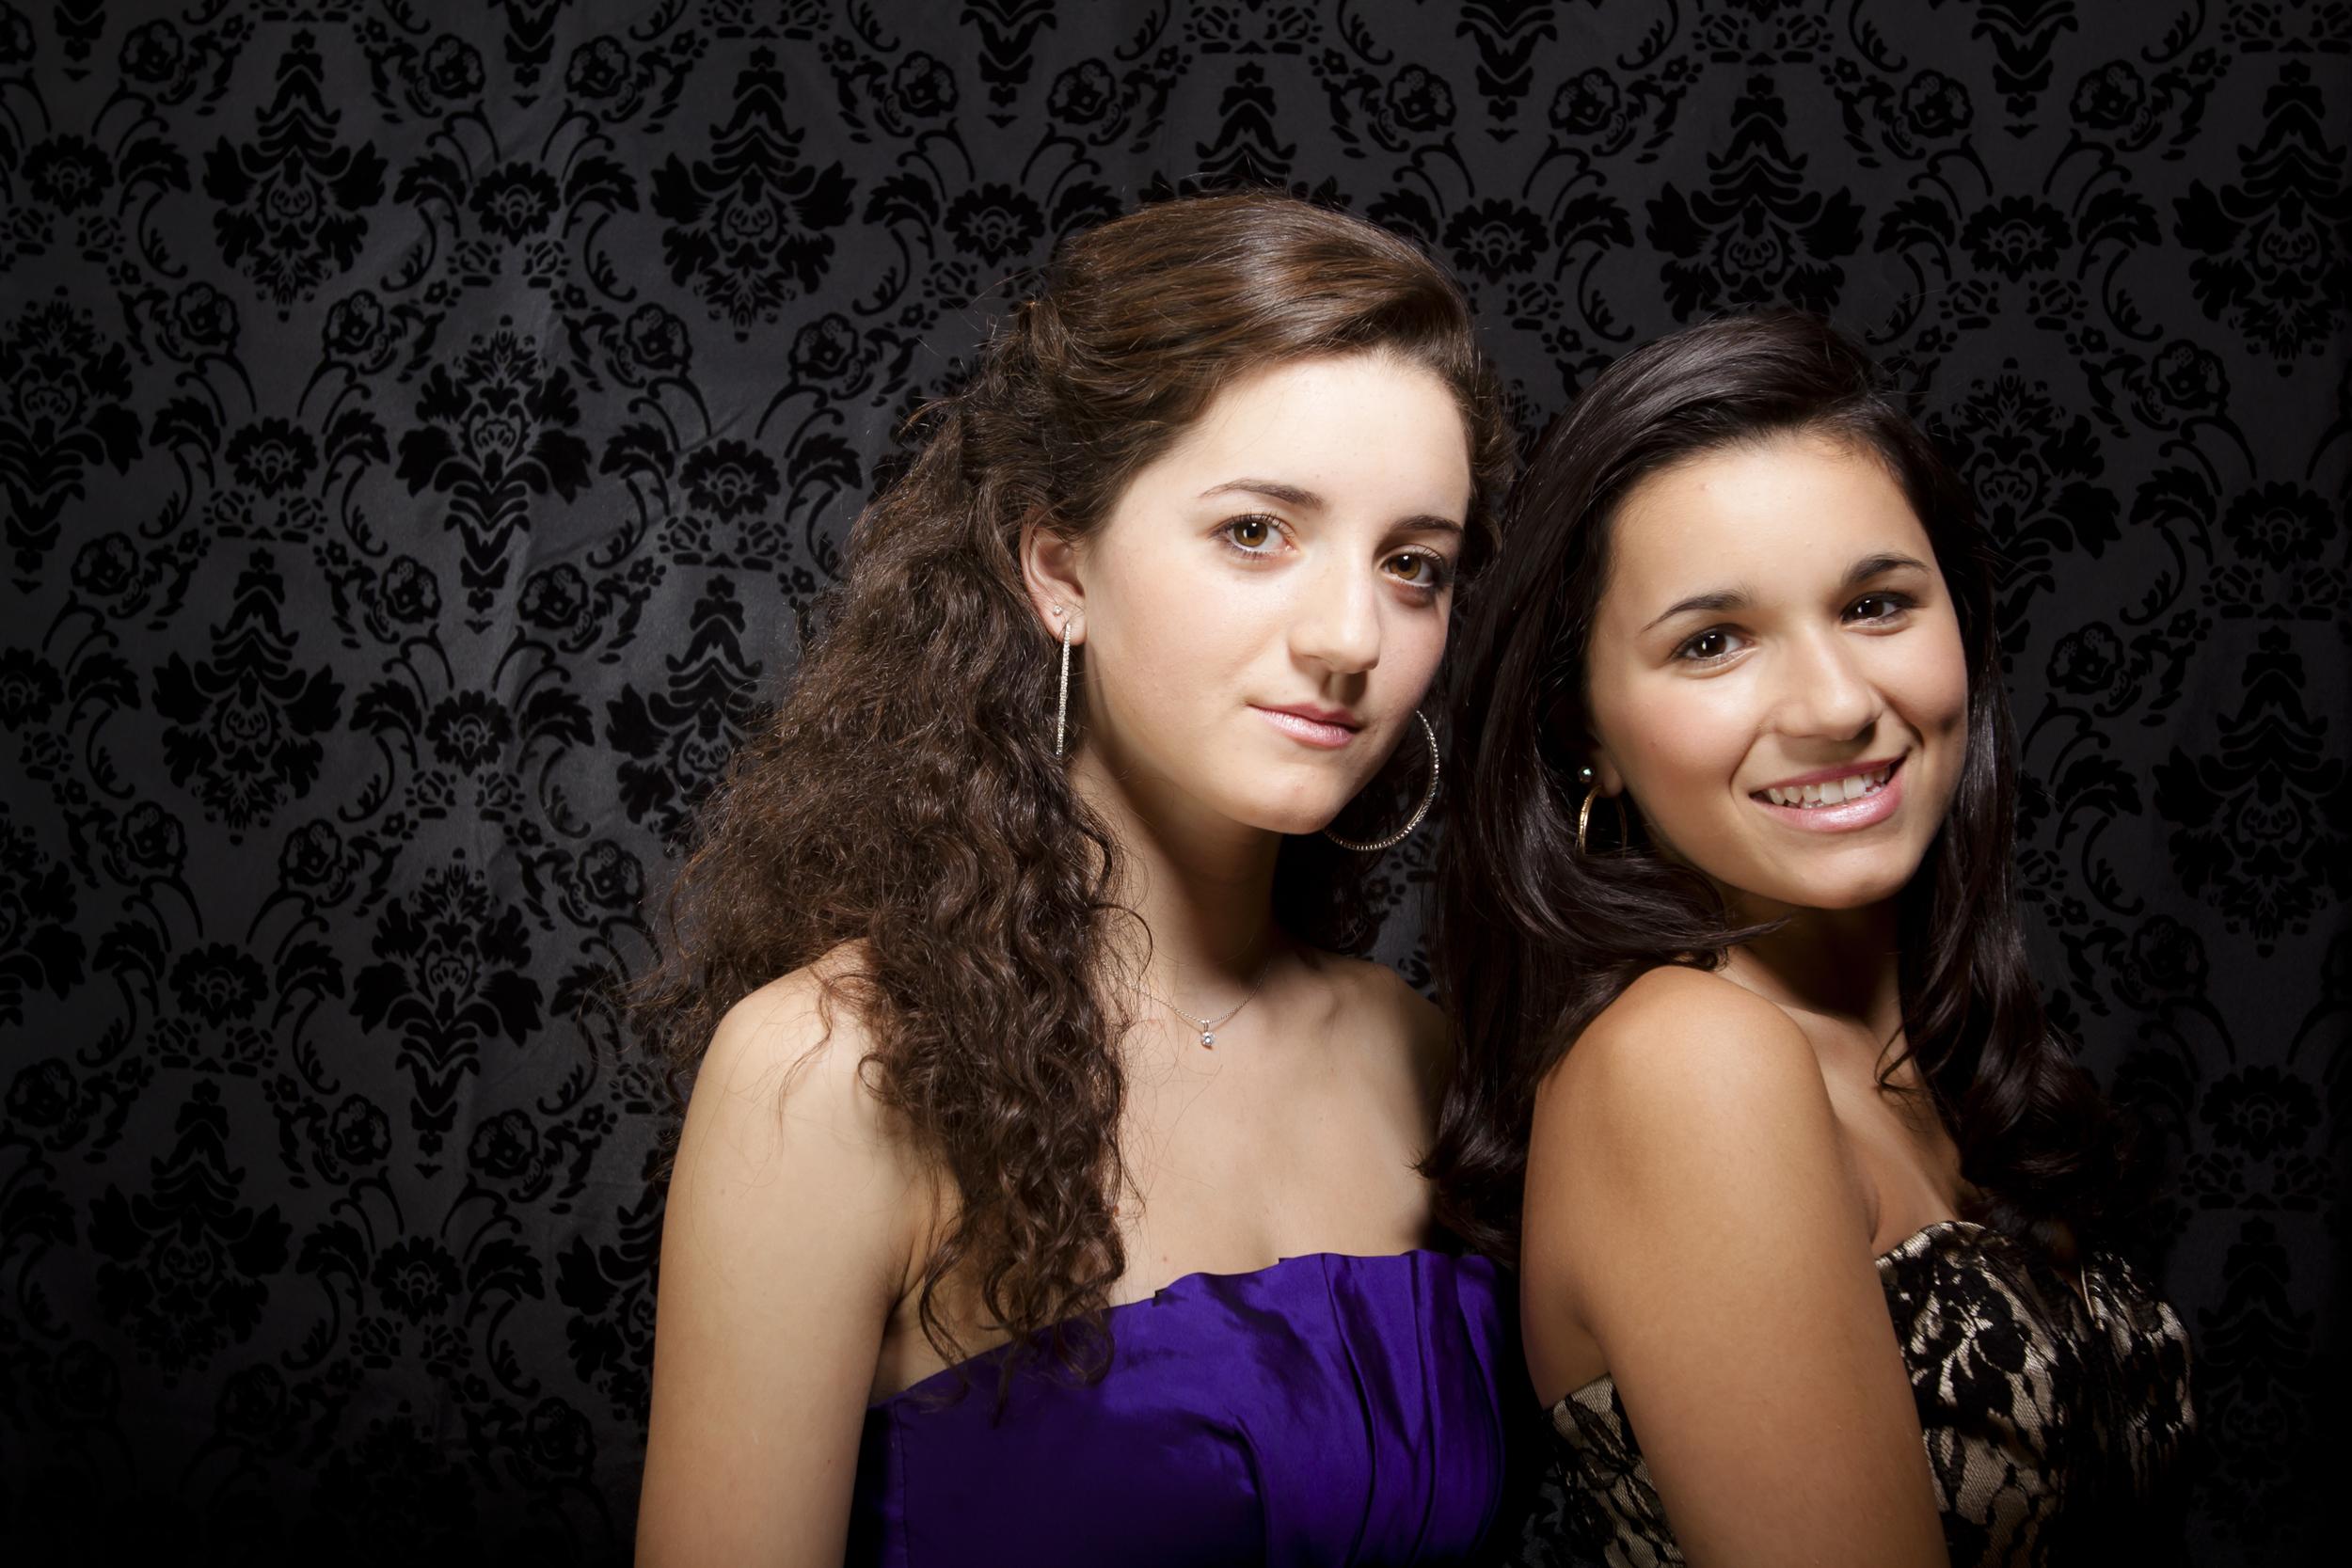 modern styled family portrait session prom dress sisters on black background 2.jpg